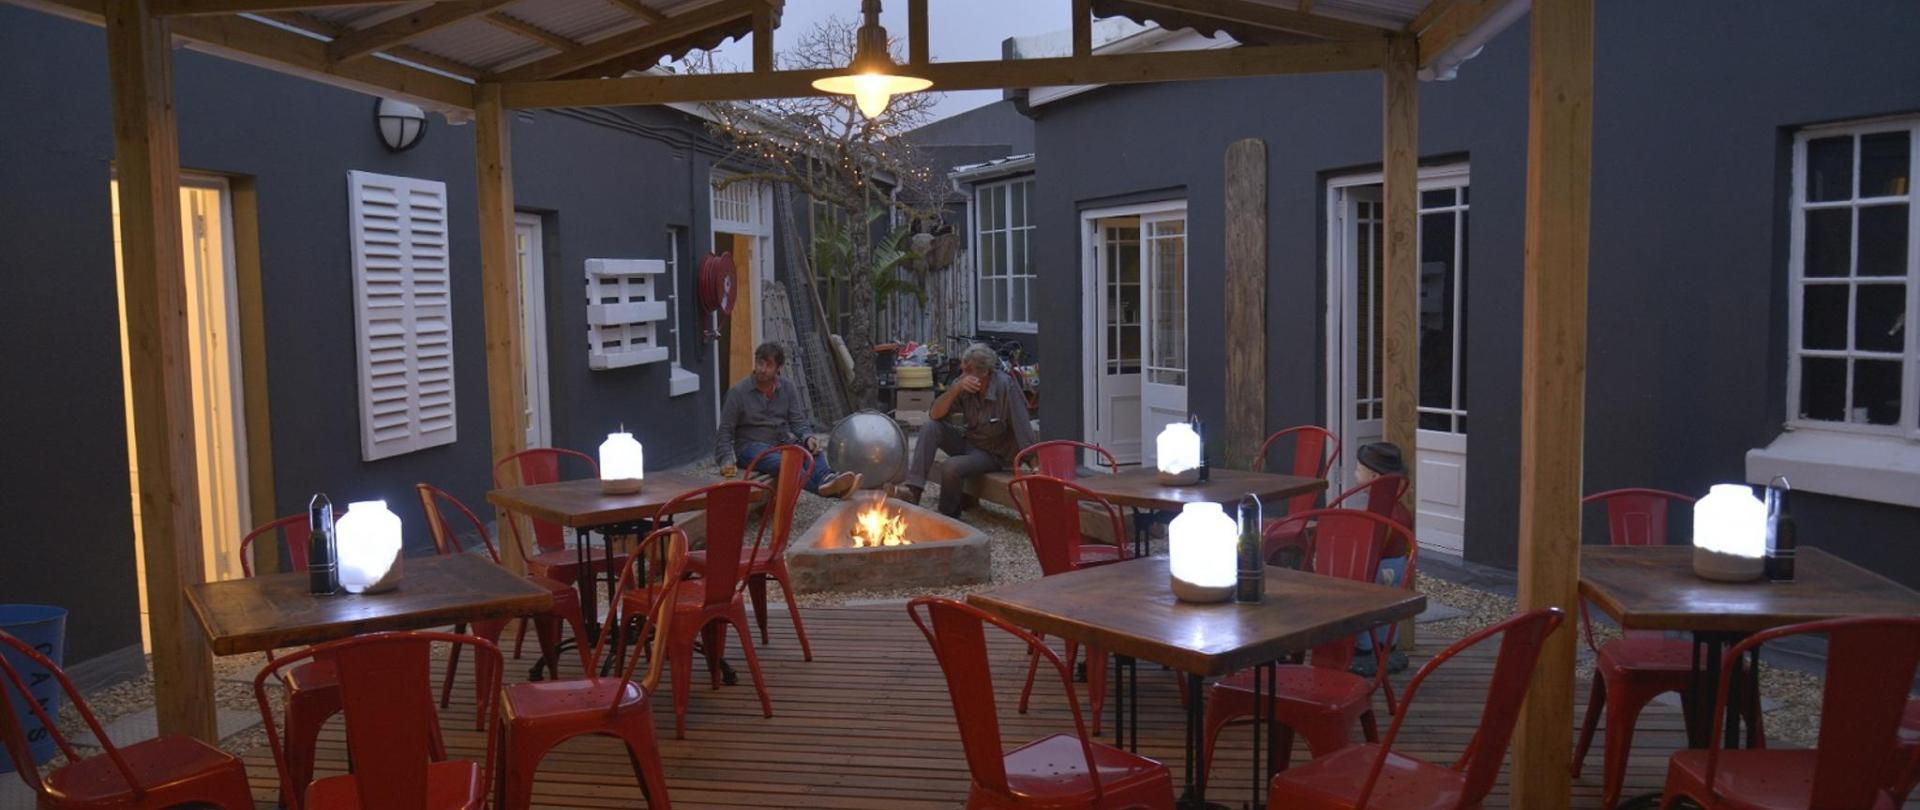 dinning bar area.JPG